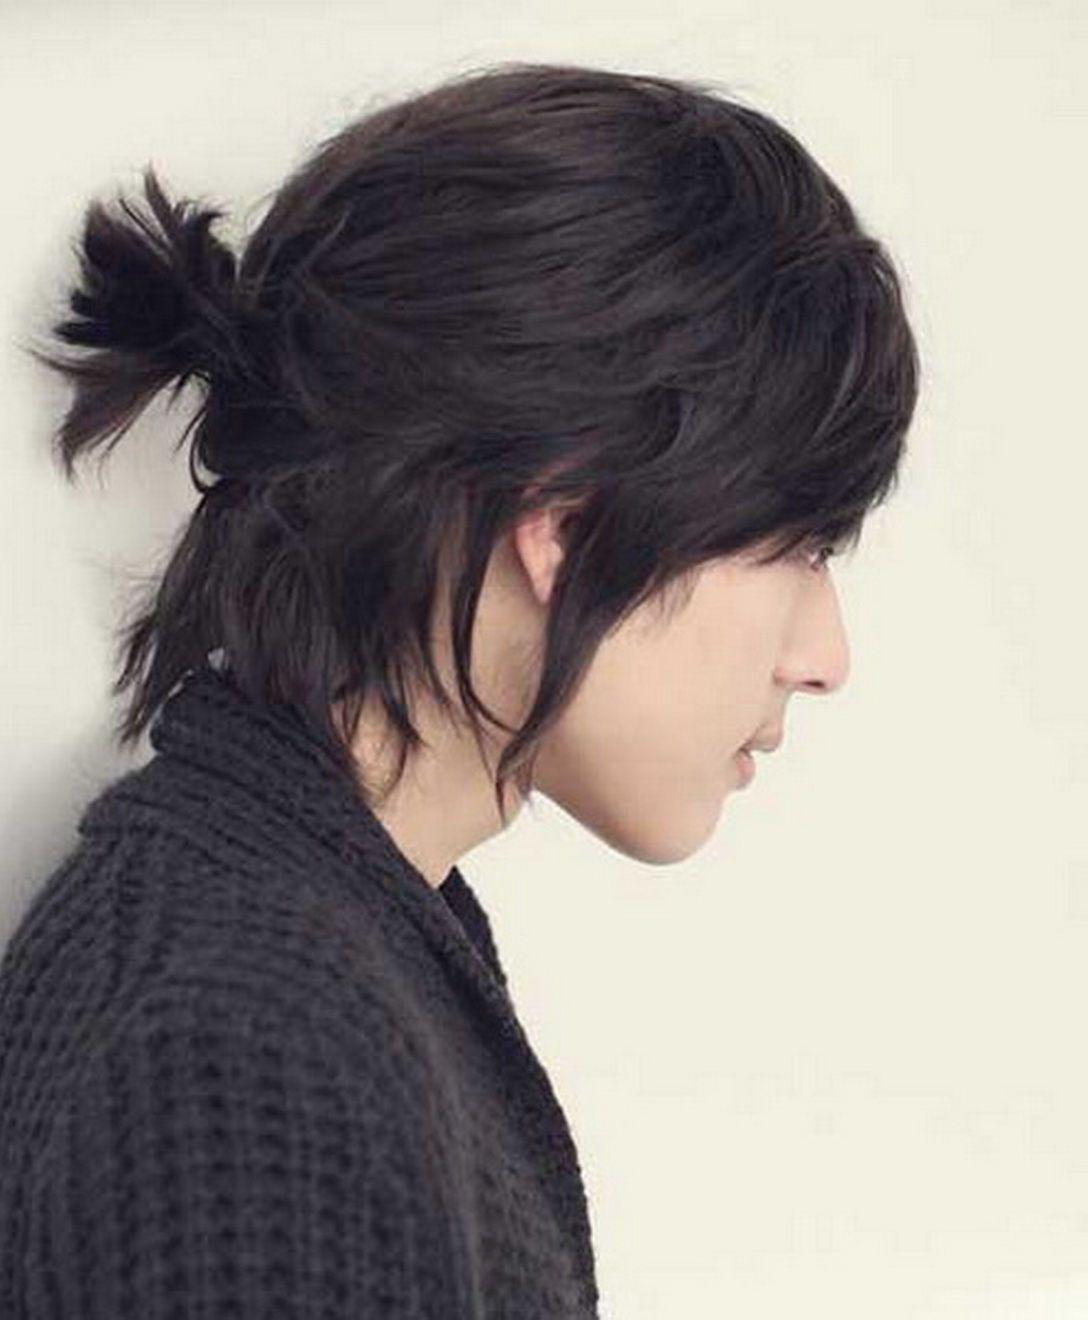 Korean Hairstyles For Men 2018 16 In 2020 Asian Long Hair Long Hair Styles Asian Haircut